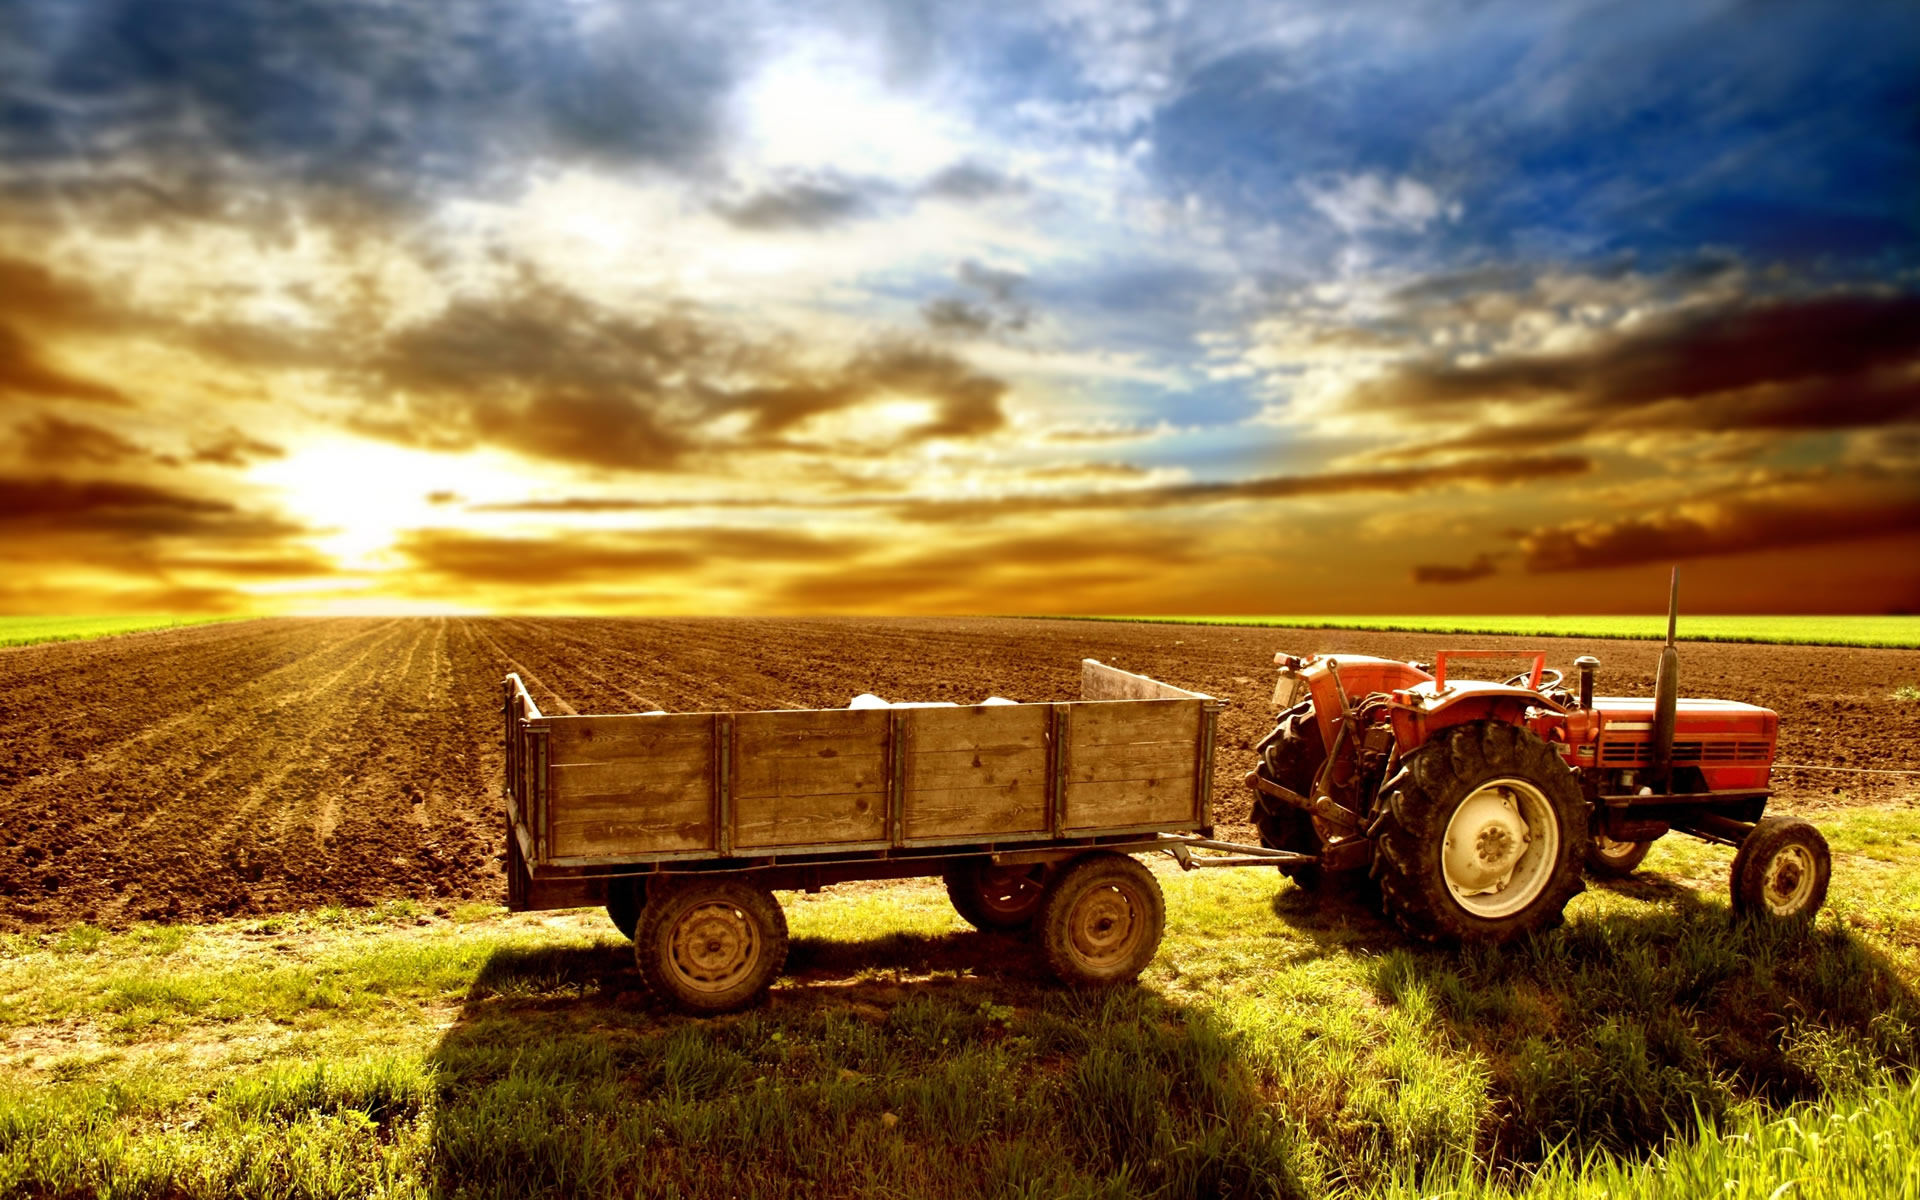 farm-wallpaper-1920x1200-0911088.jpg